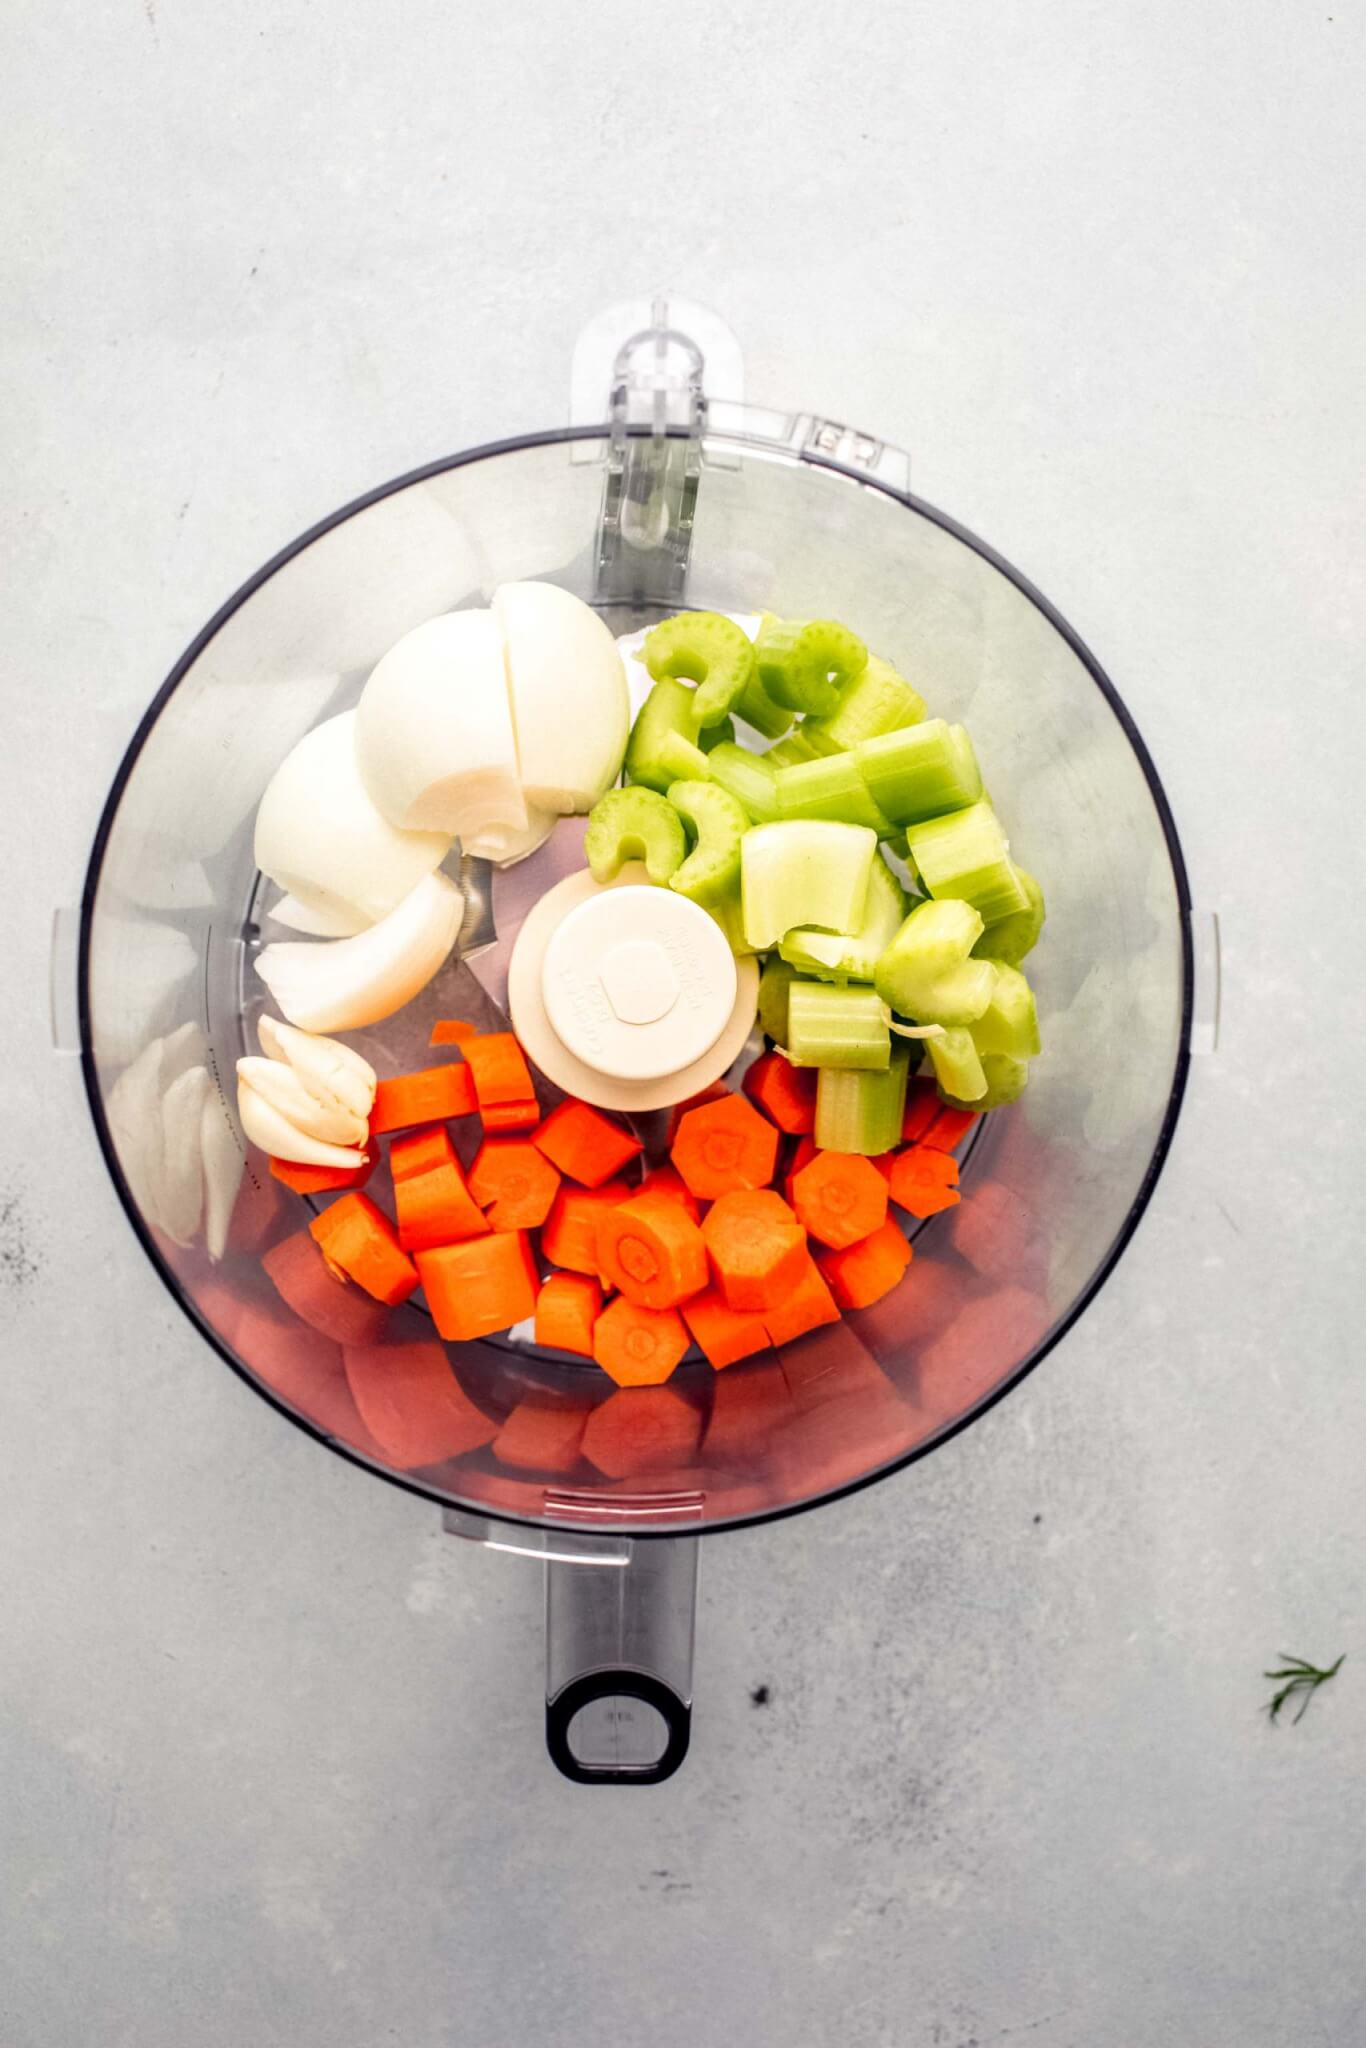 top shot of vegetables in food processor